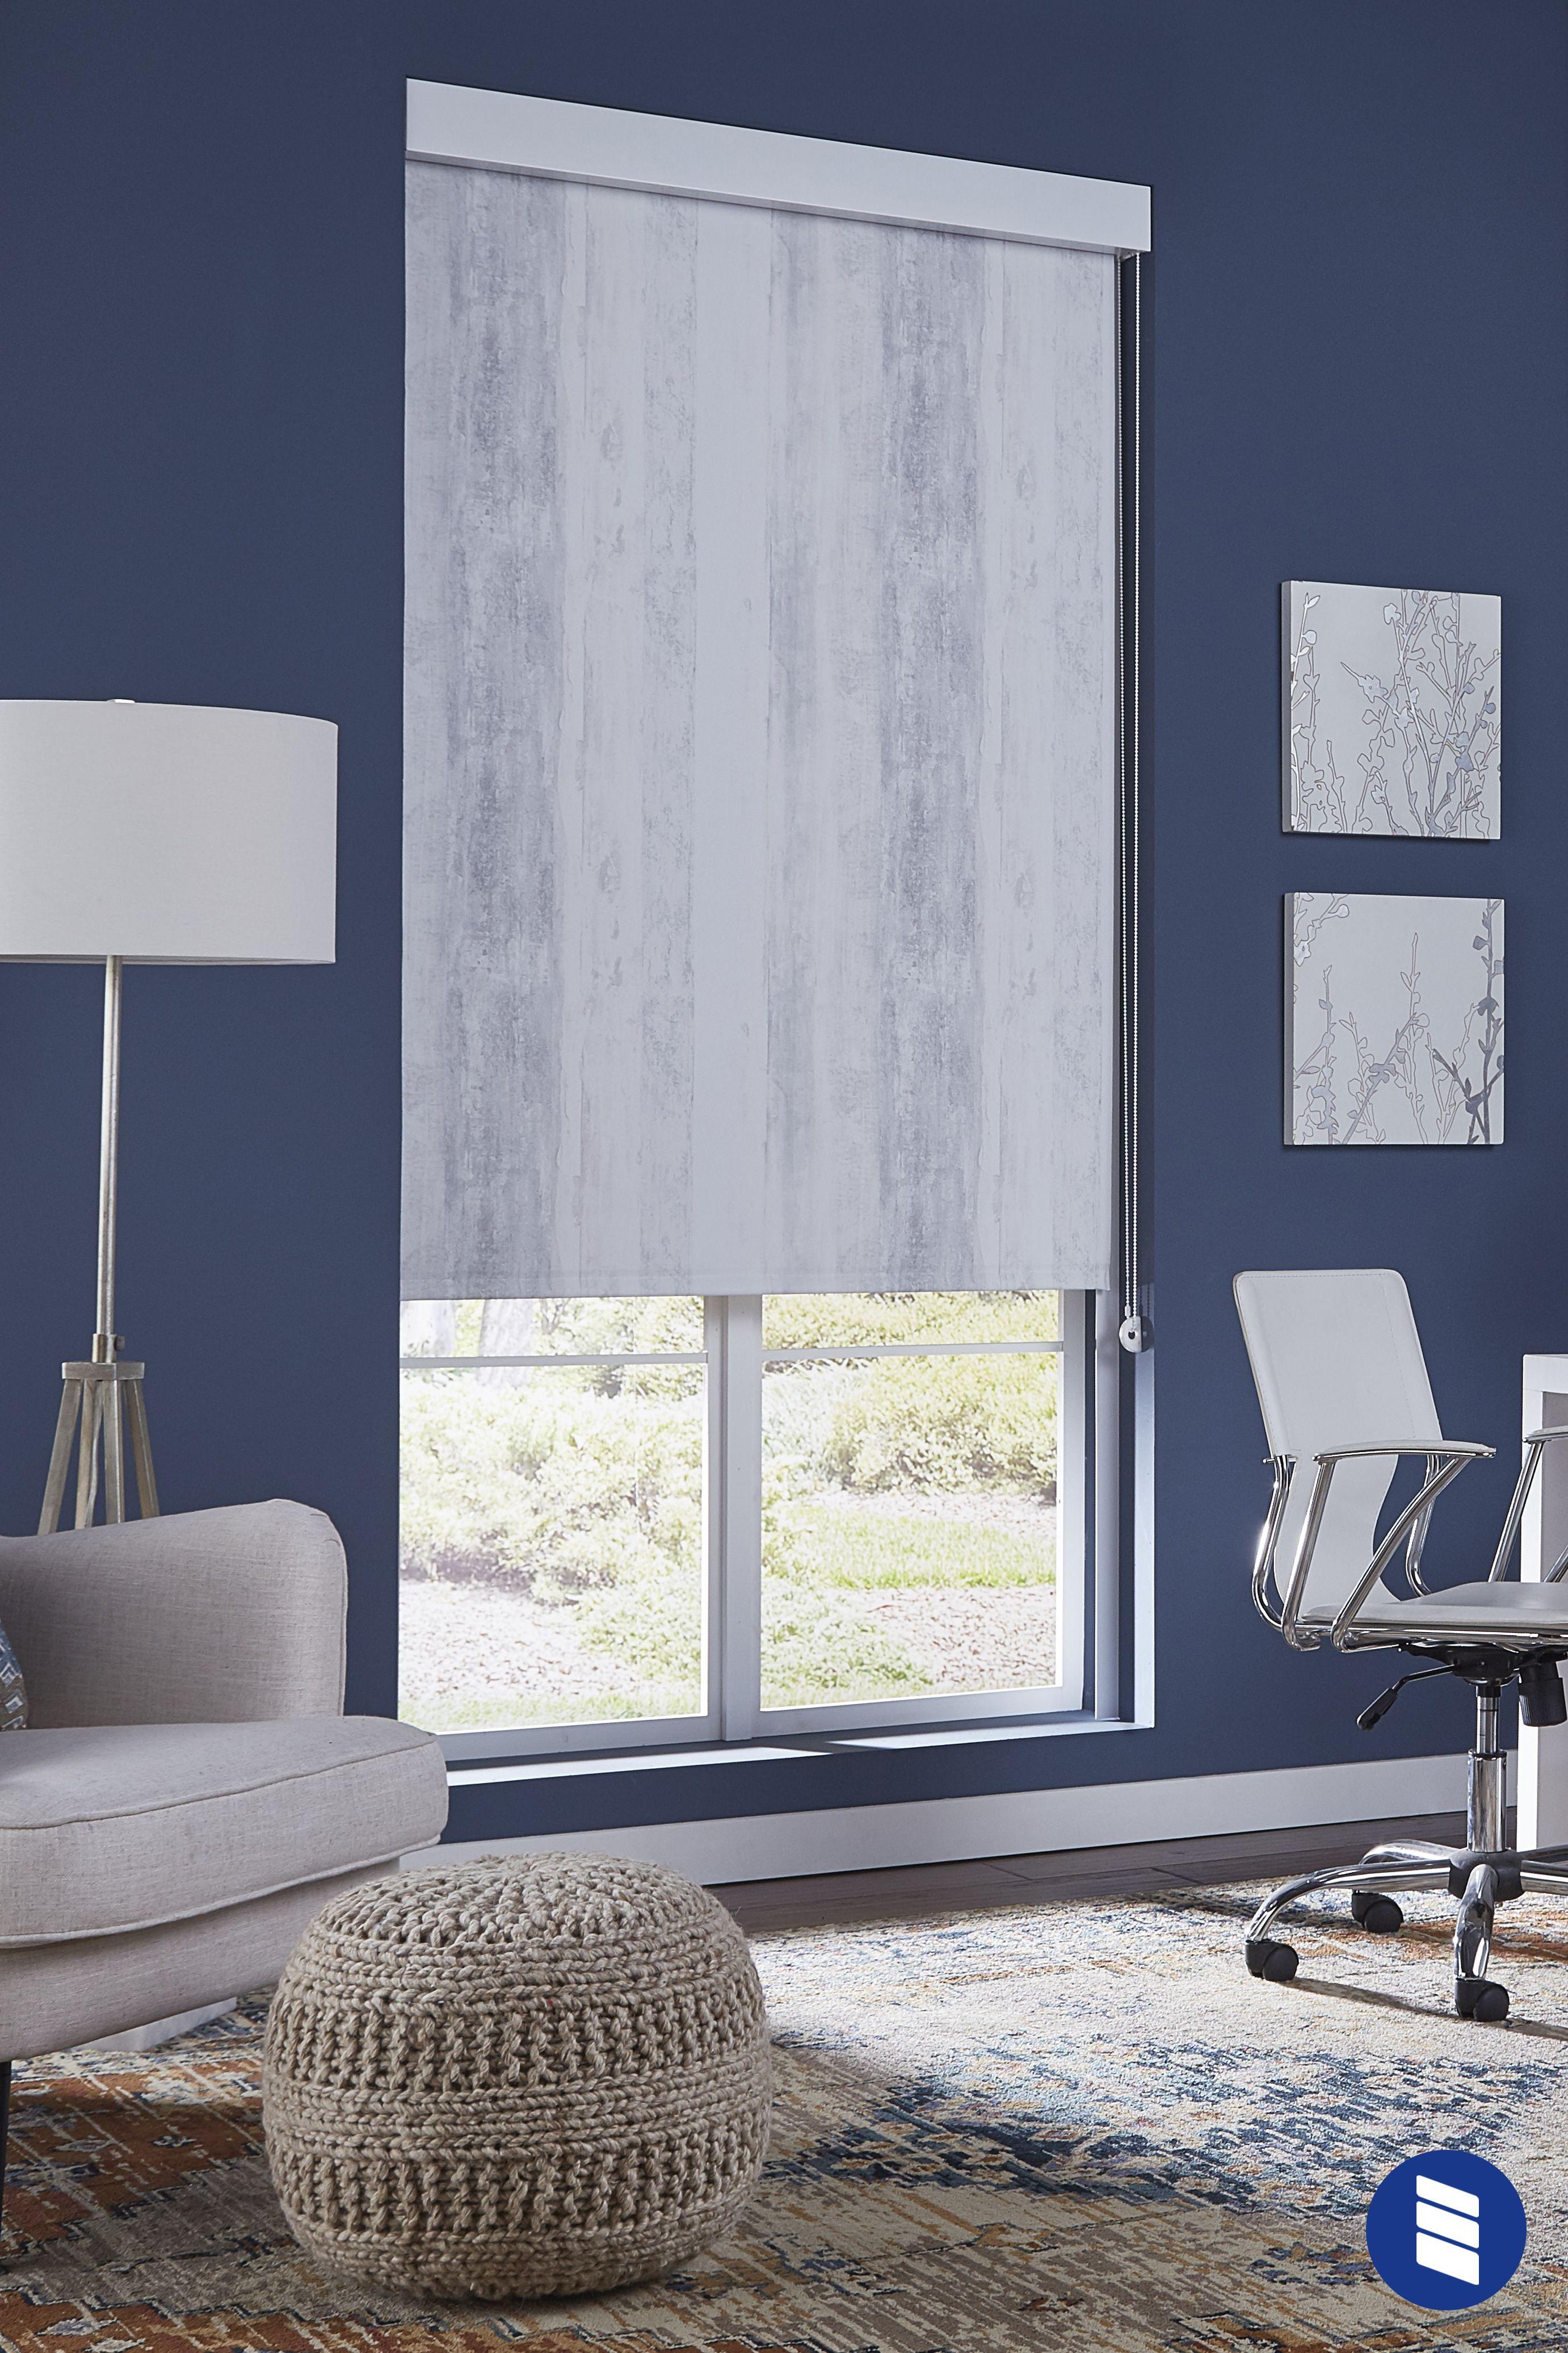 Blackout Roller Shades Blinds Com In 2020 Living Room Blinds Blackout Roller Shades Grey Wallpaper Bedroom